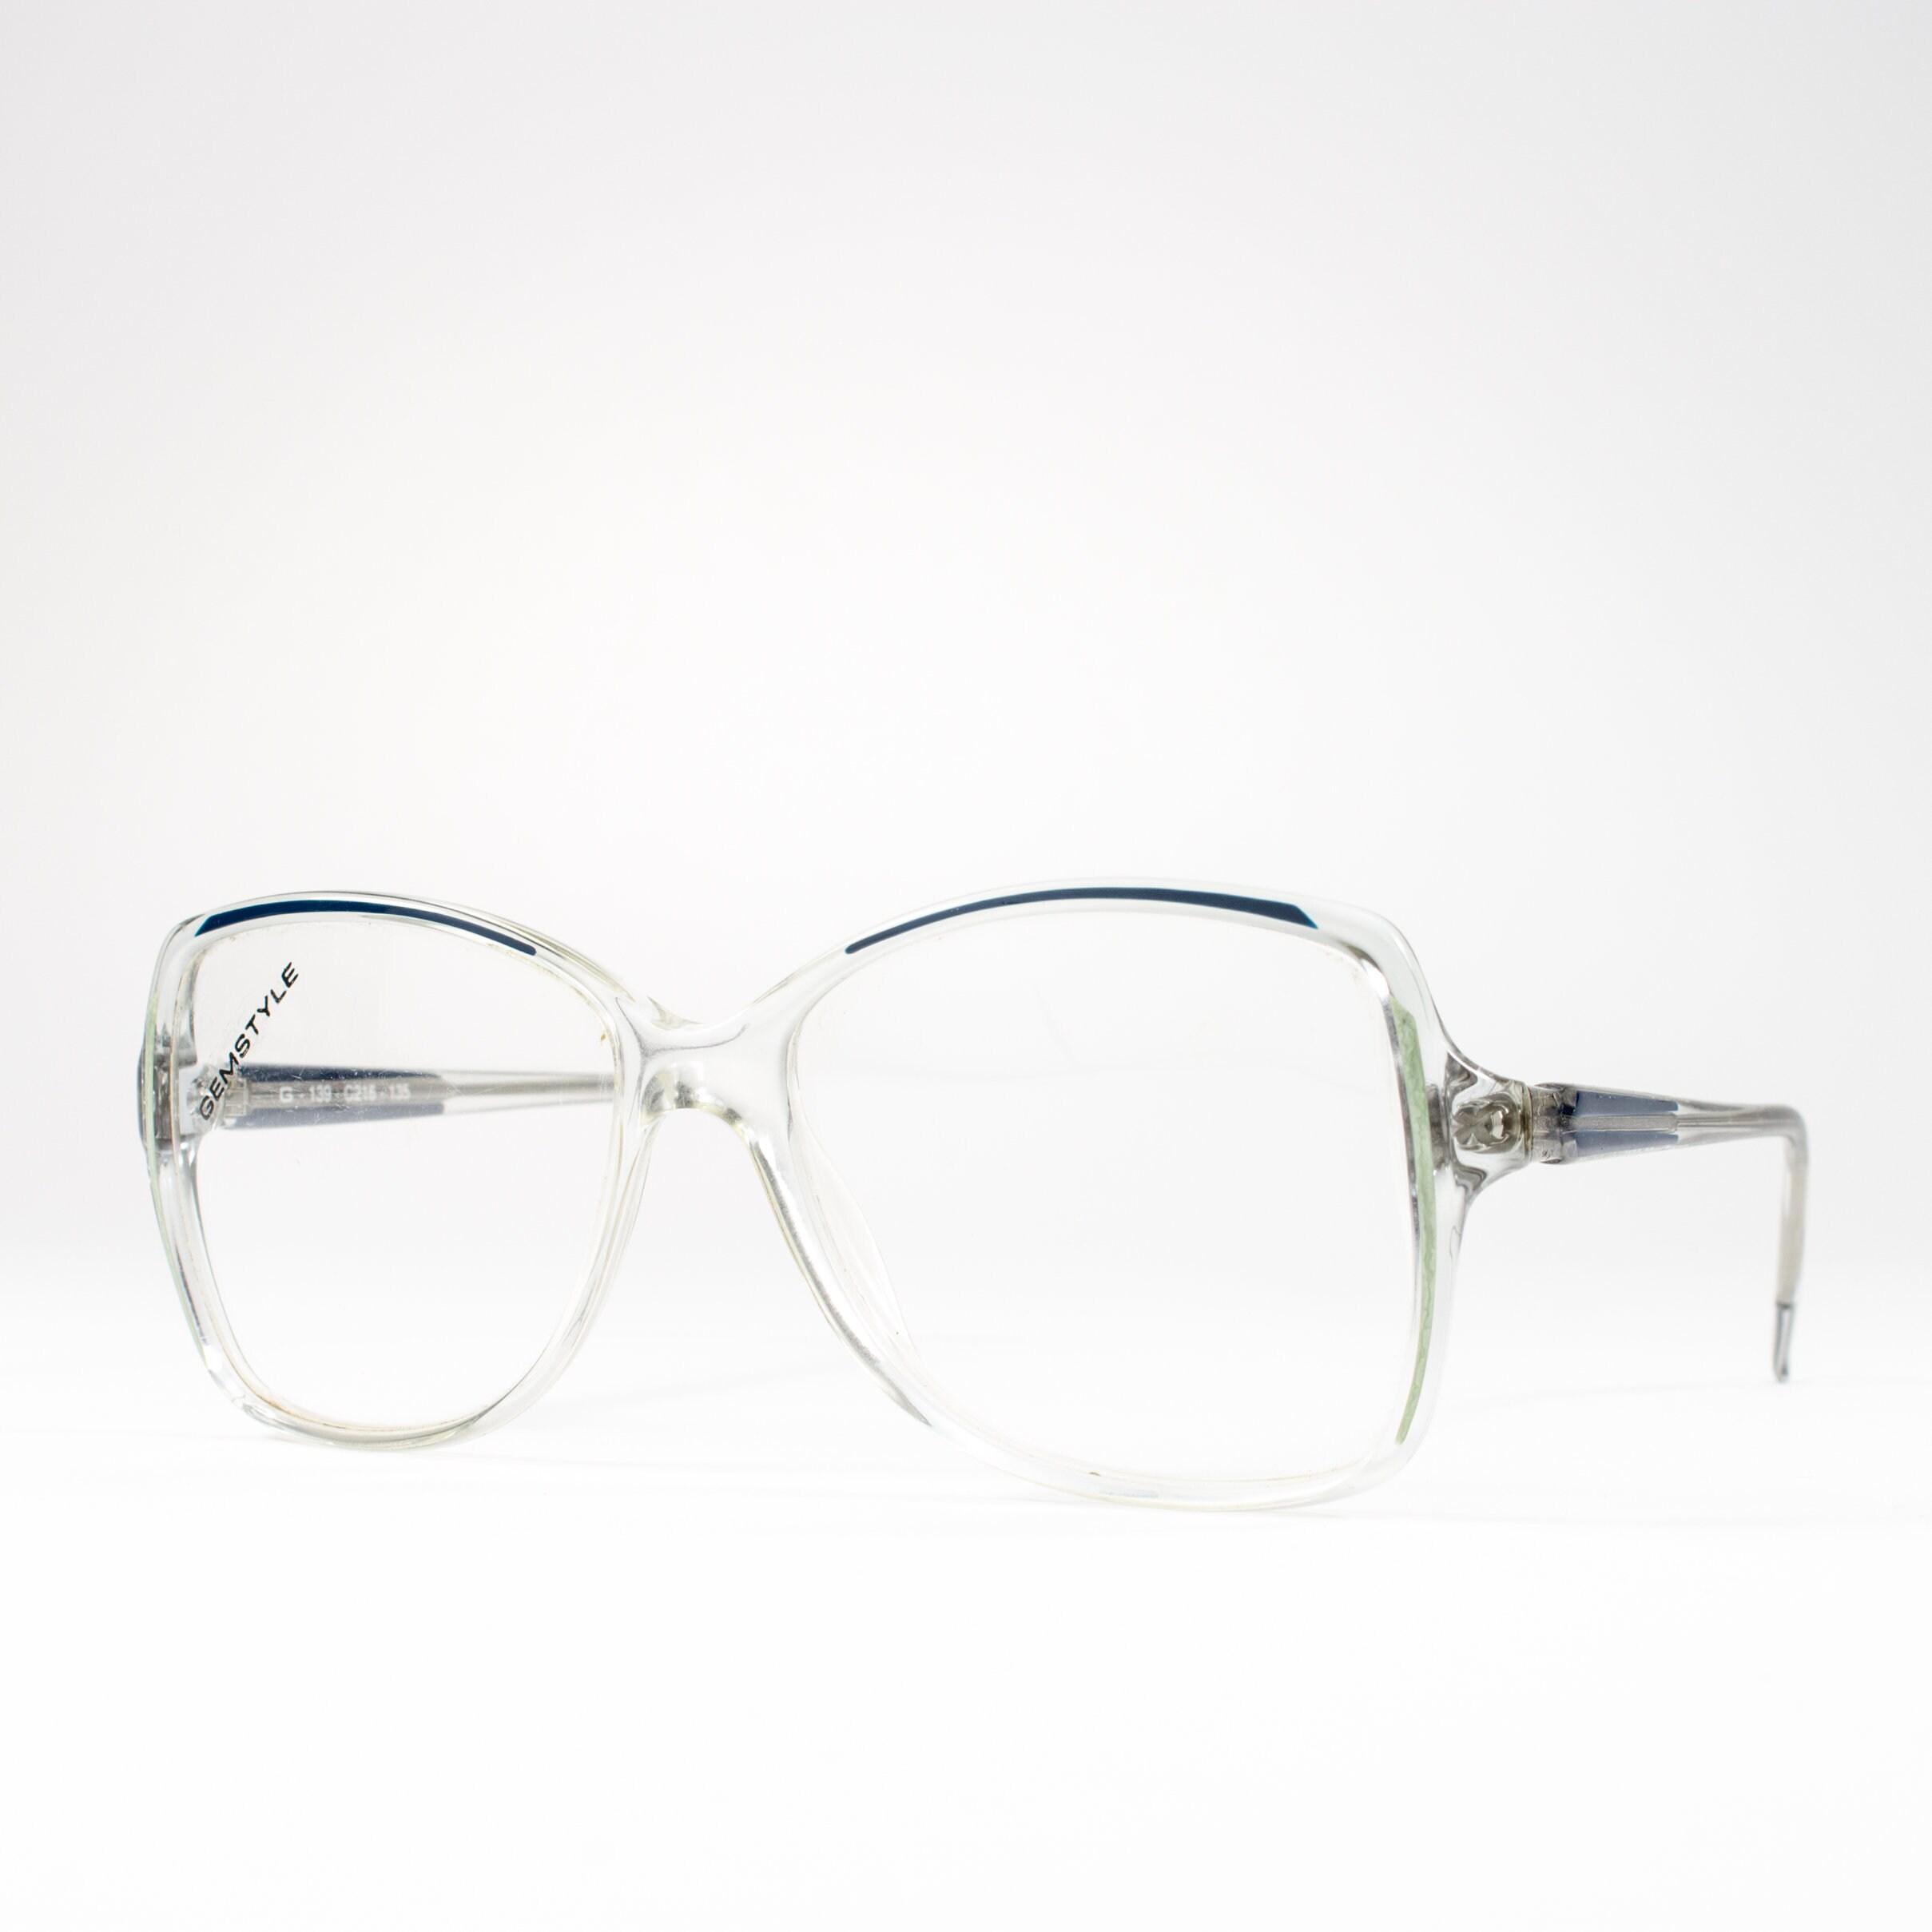 835b354add0ca 80s Glasses 1980s Vintage Eyeglasses Clear Glasses Frames